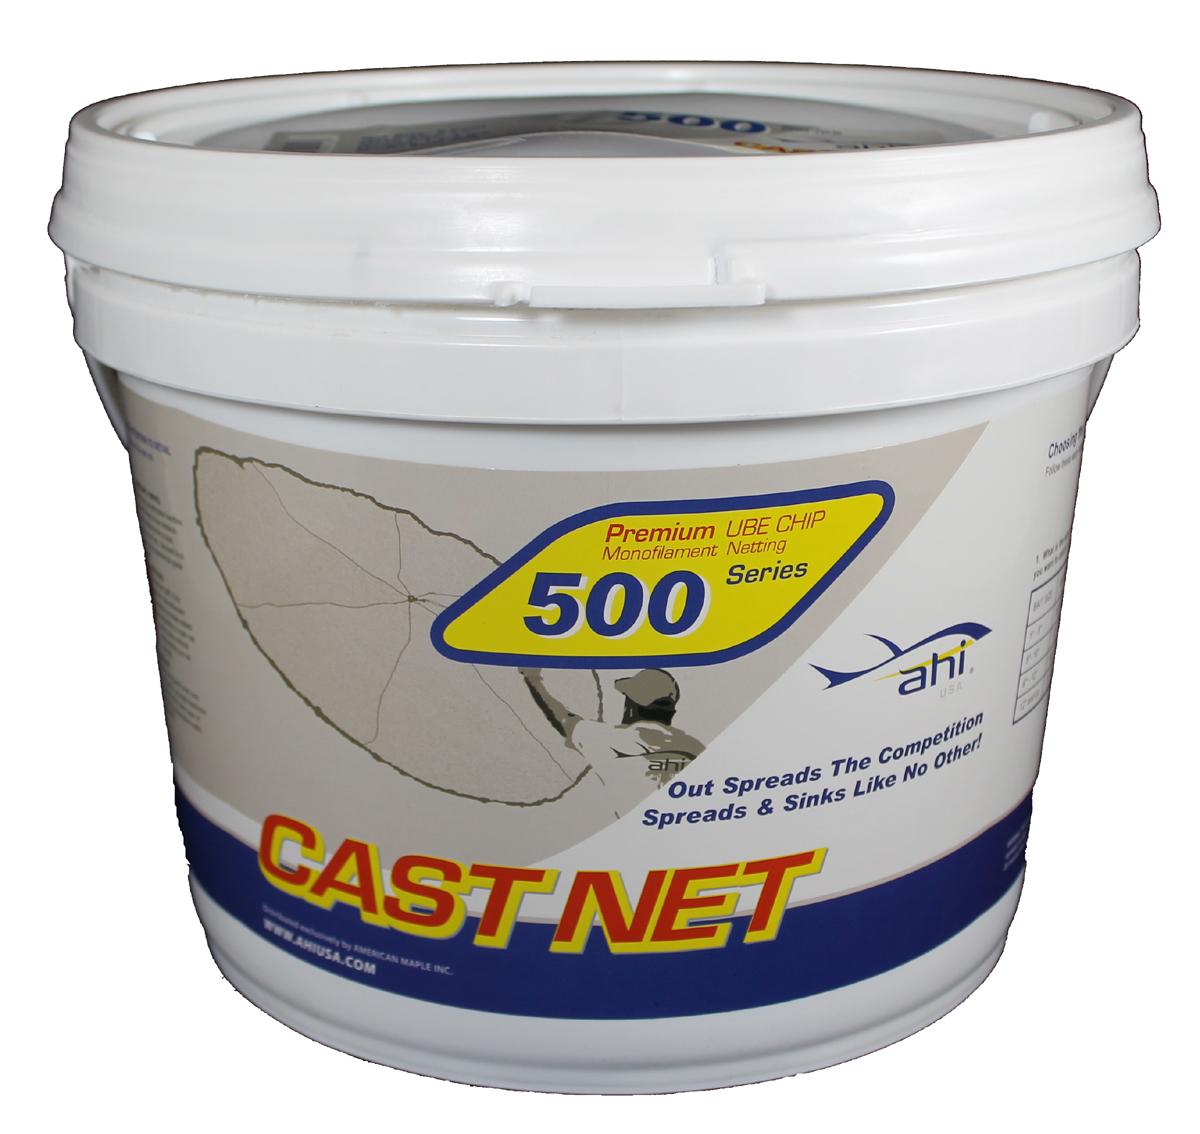 Ahi USA Ahi USA 500 Pro Series Cast Net - 9' PartNumber: 00690911000P KsnValue: 8941690 MfgPartNumber: CN-509